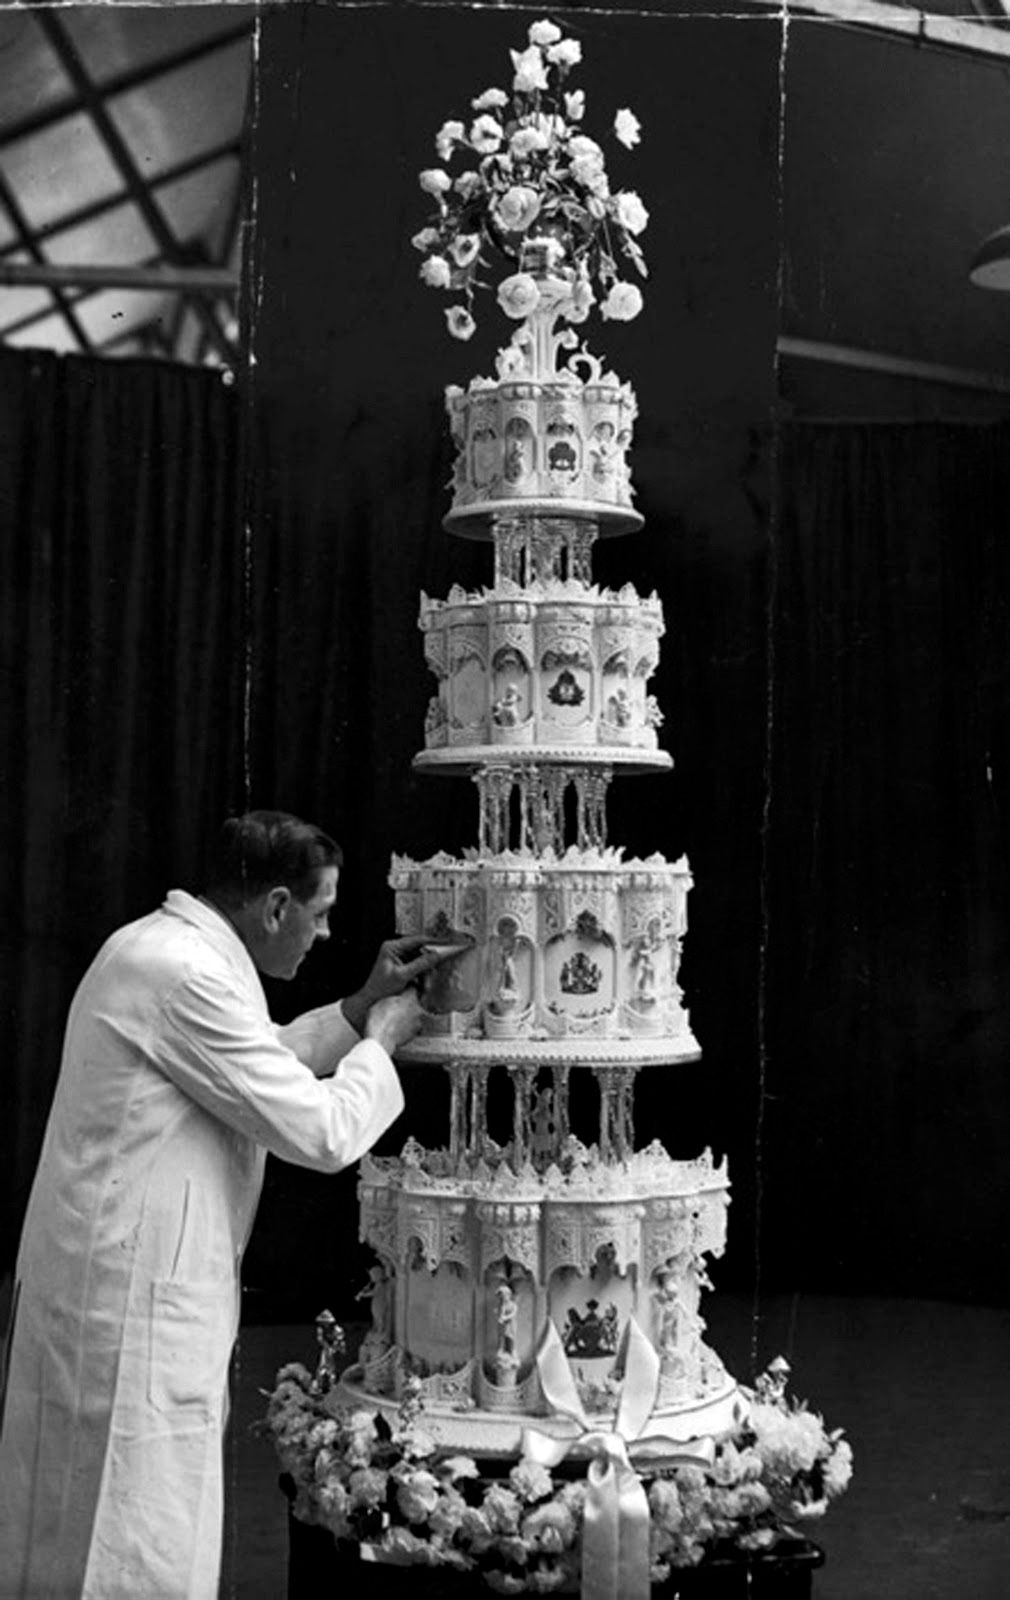 Maudelynn S Menagerie Photo Konigliche Hochzeitstorten Royale Hochzeiten Hochzeitstorte Ideen